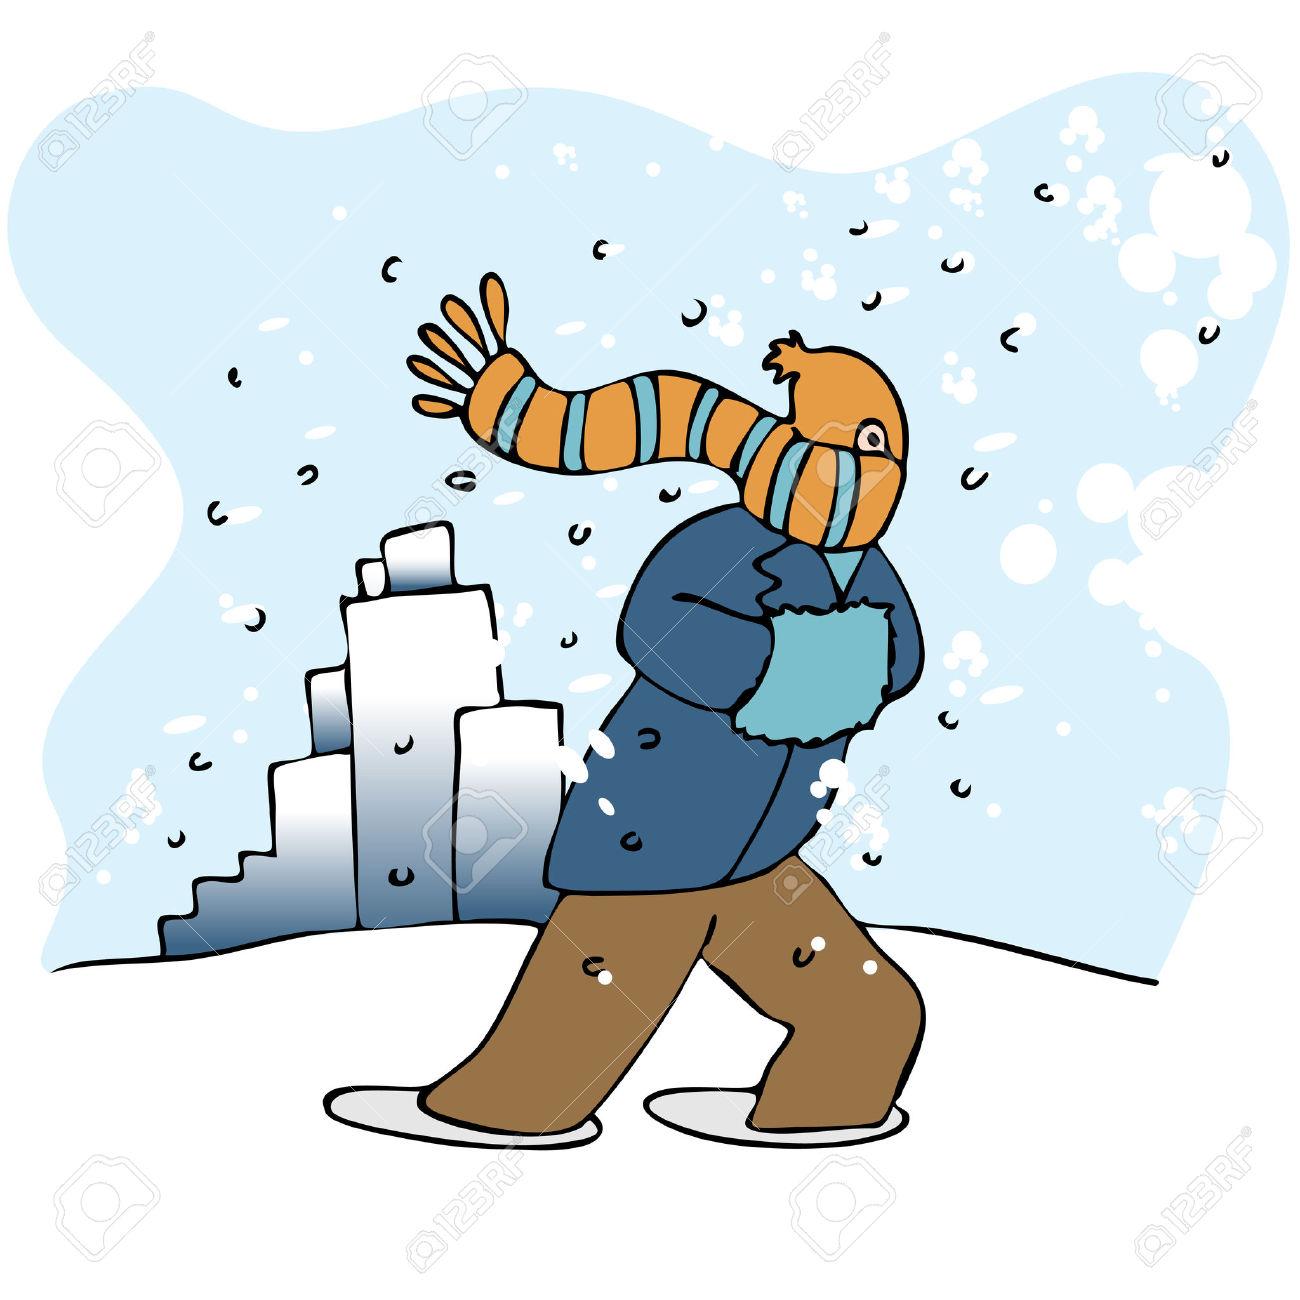 Wind clipart blizzard Blizzard In cliparts Walking Blizzard